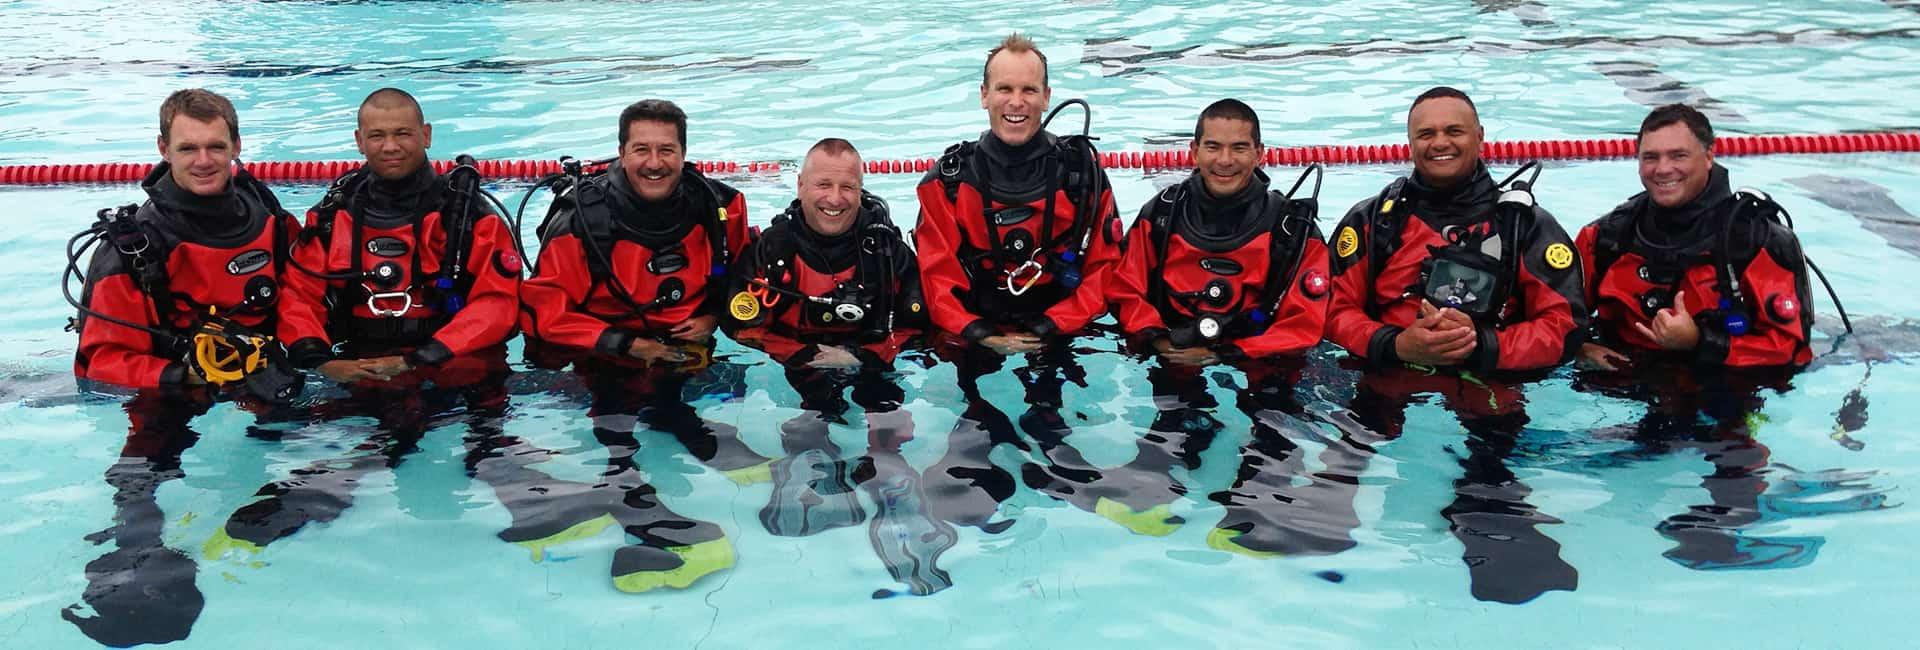 dive-rescue-class-host